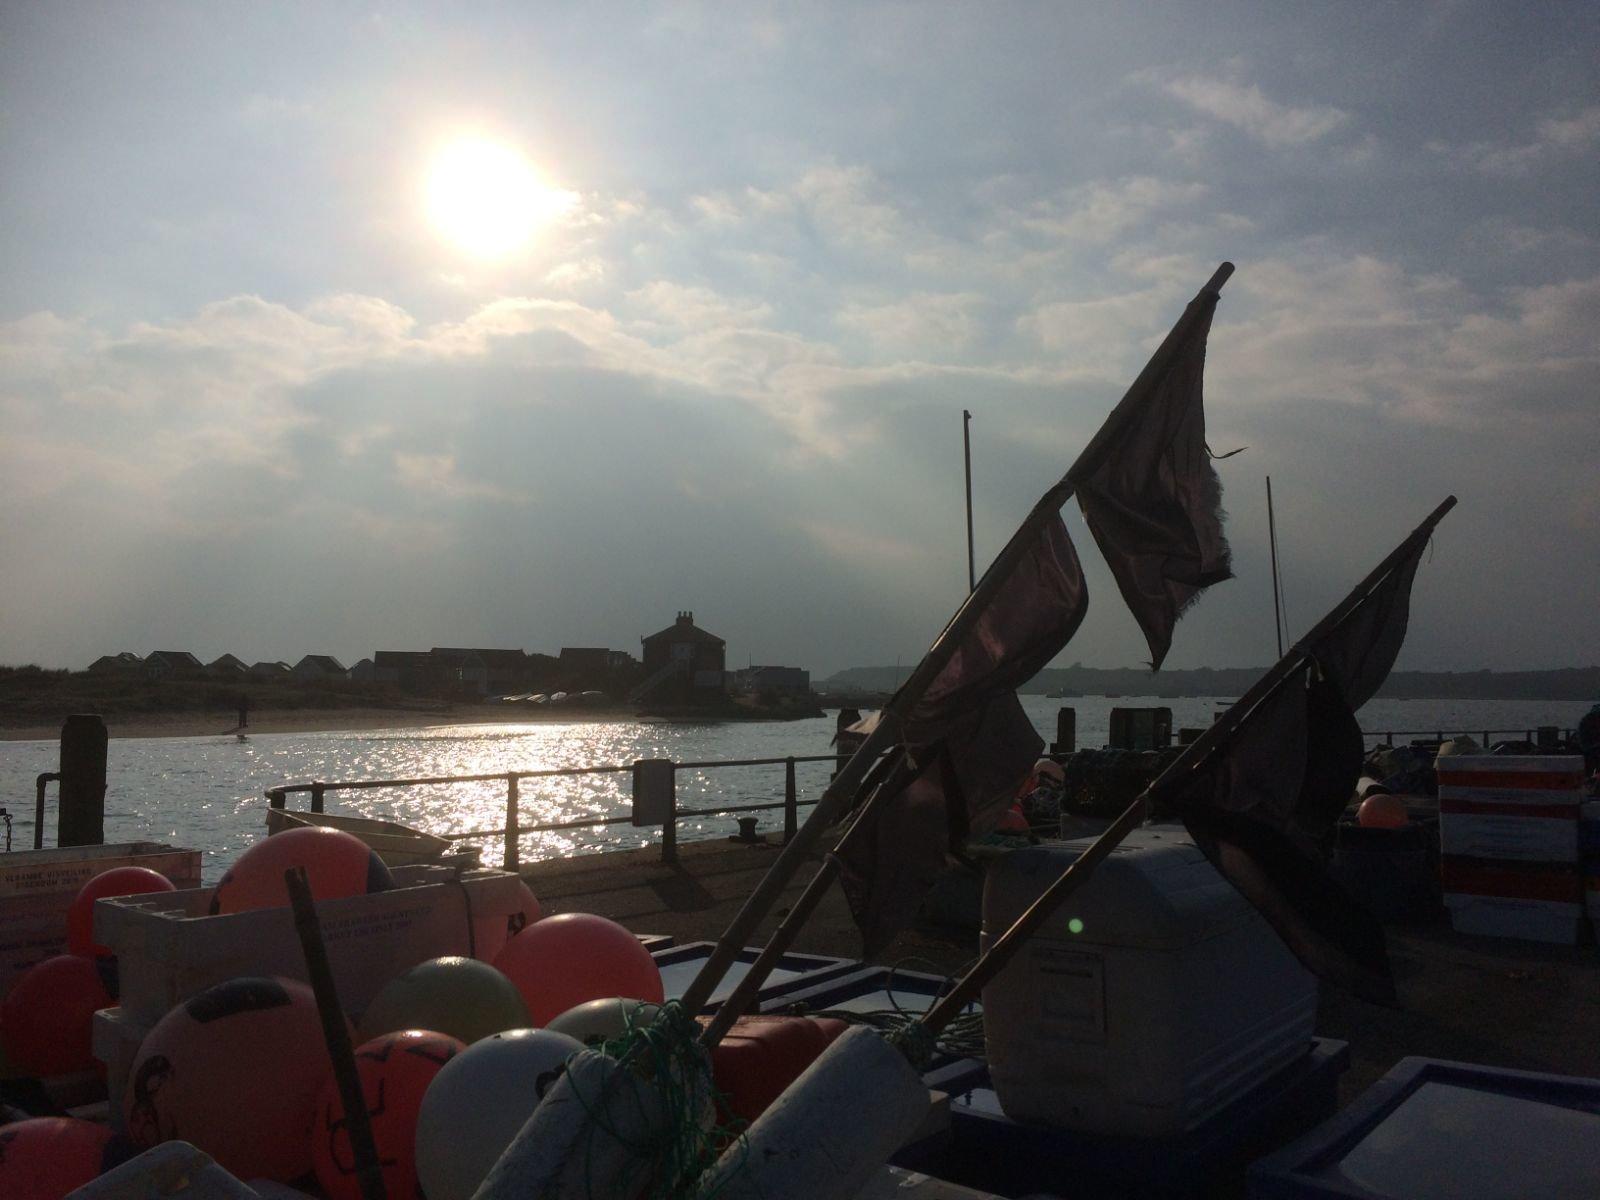 Fishing gear Mudeford Dorset-2